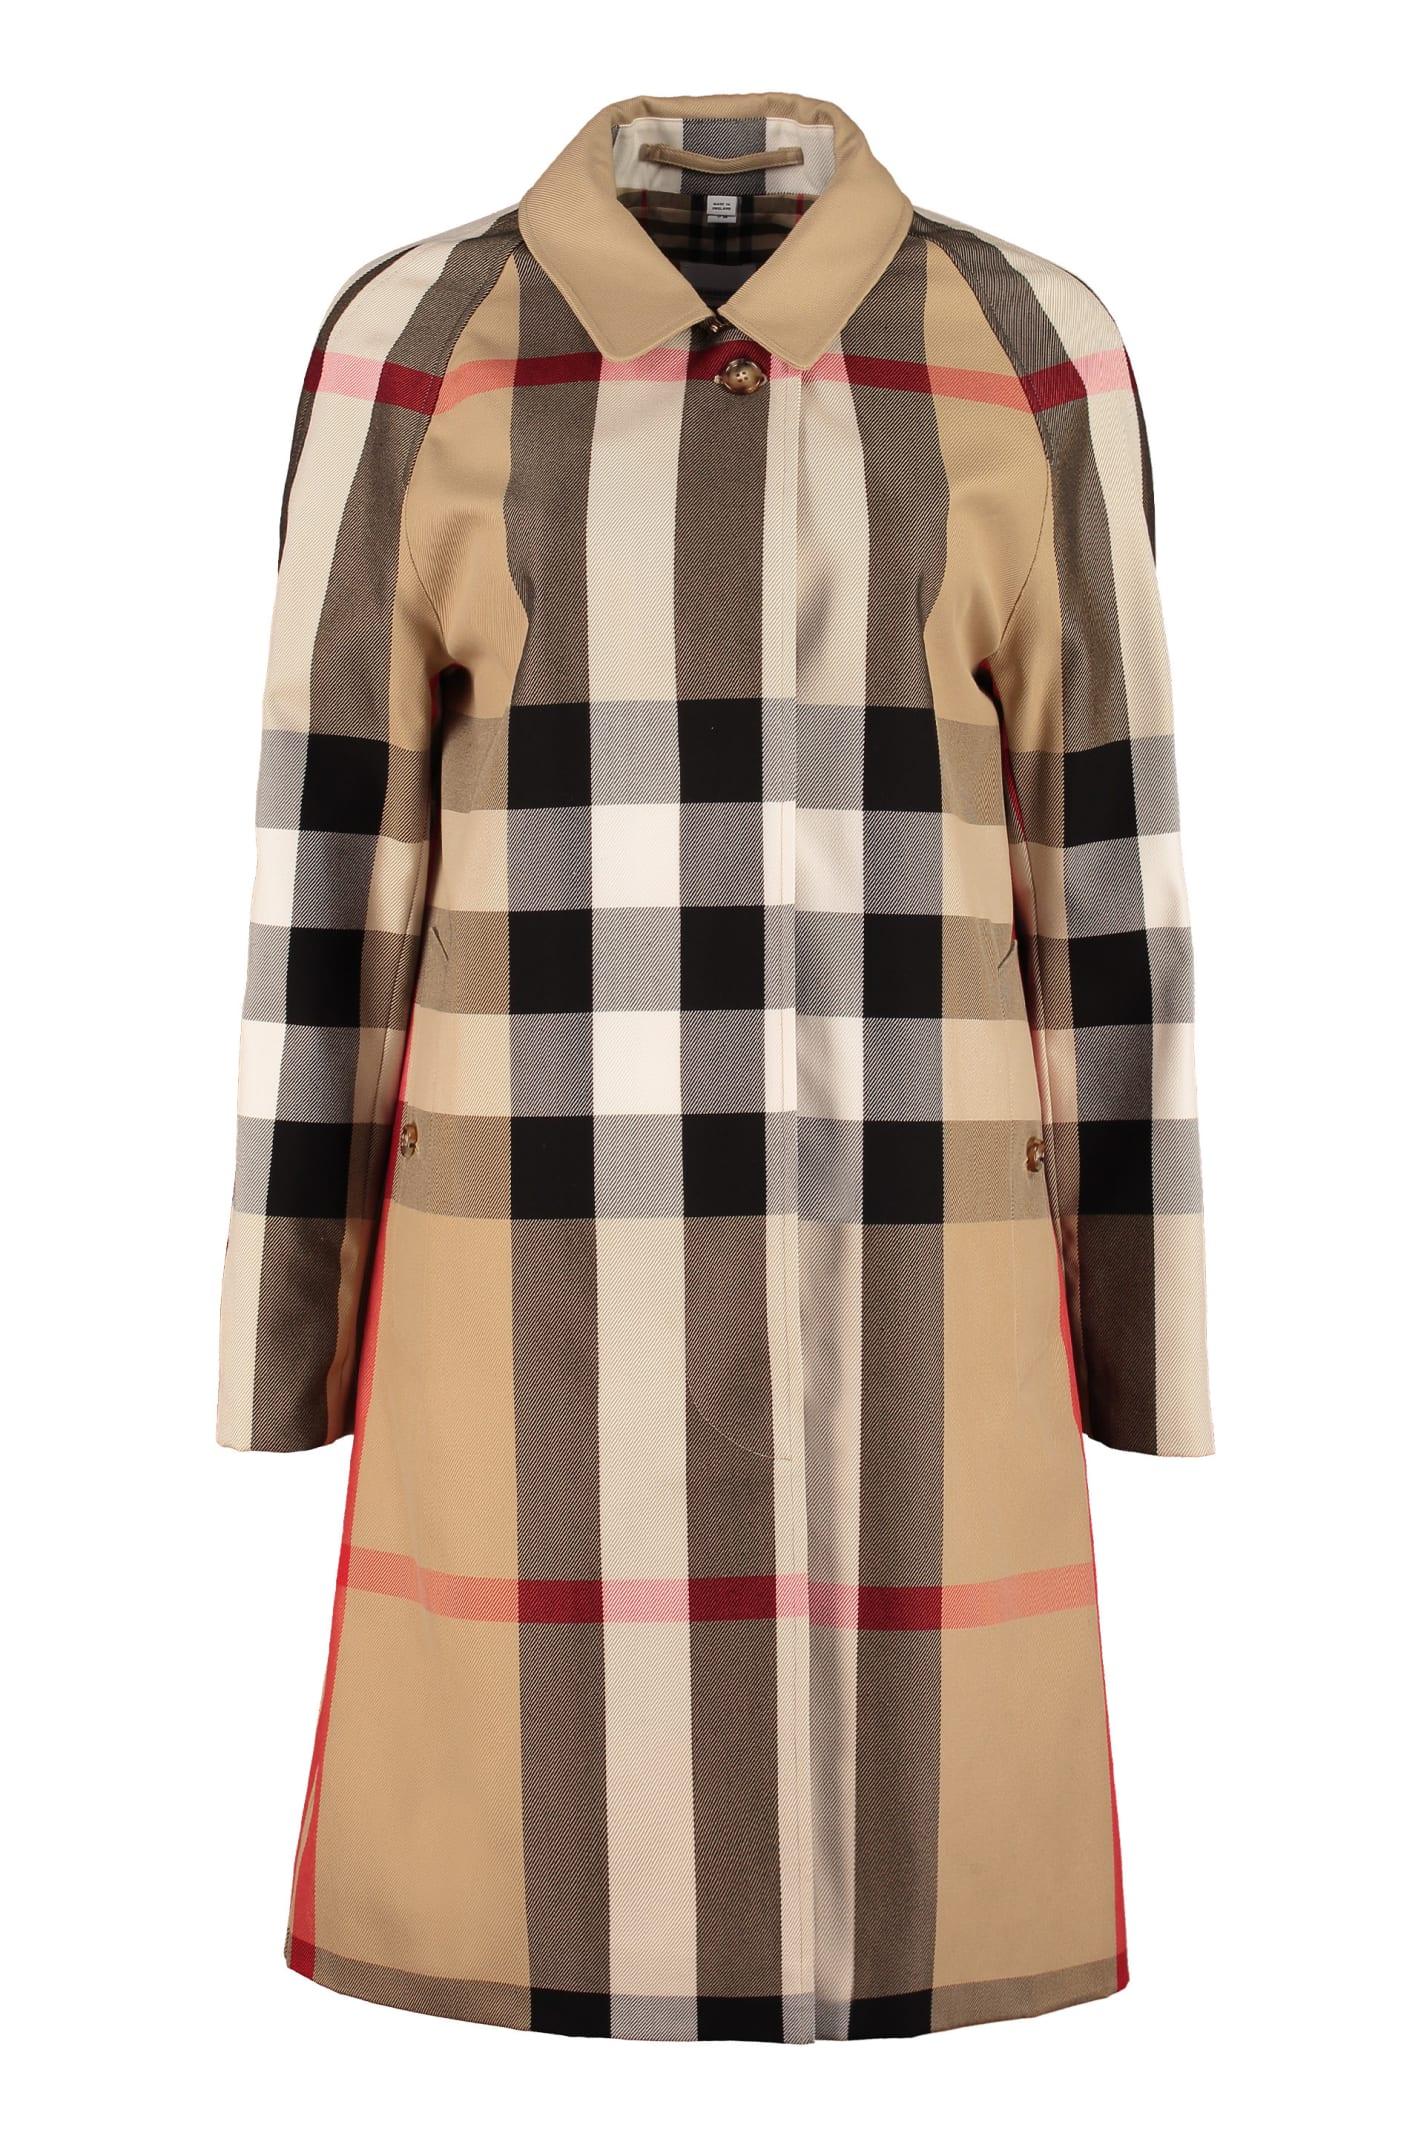 Burberry Checked Print Coat